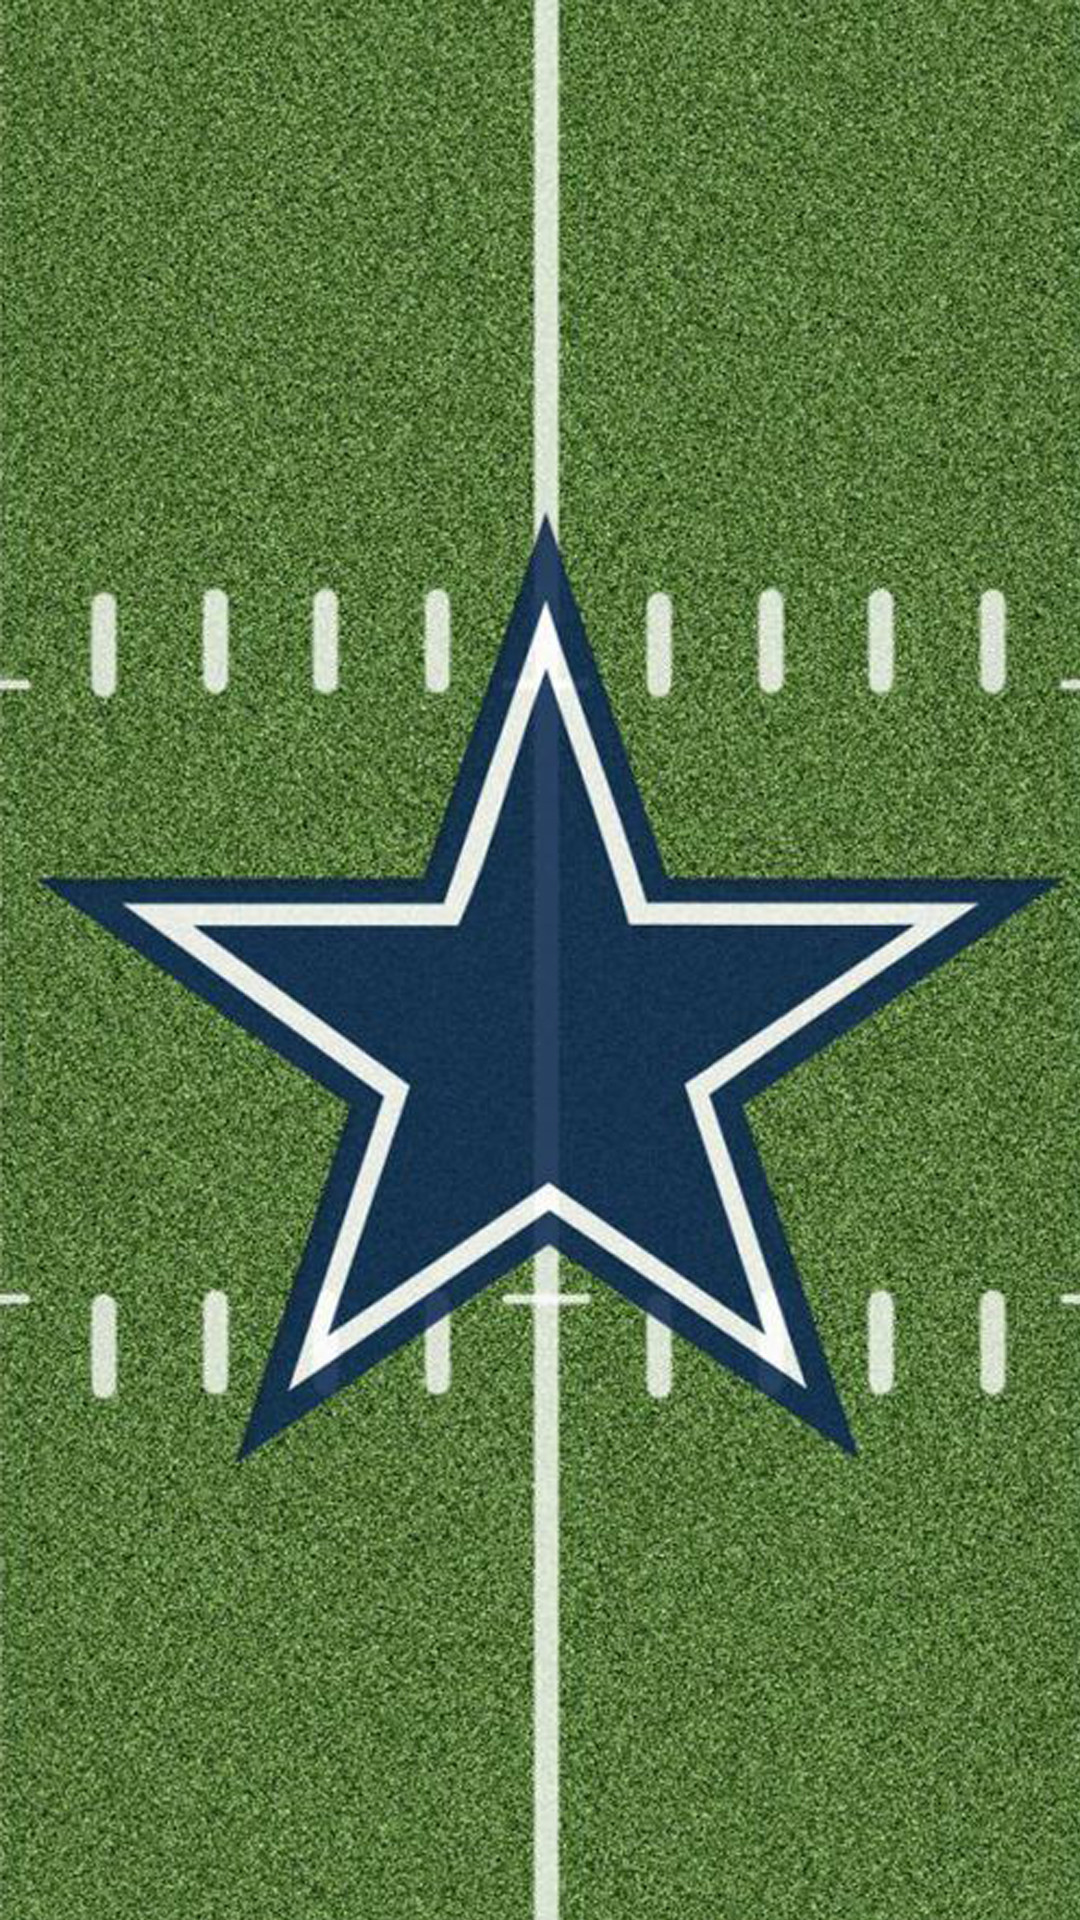 Dallas Cowboys Star Logo Wallpaper 66 Images